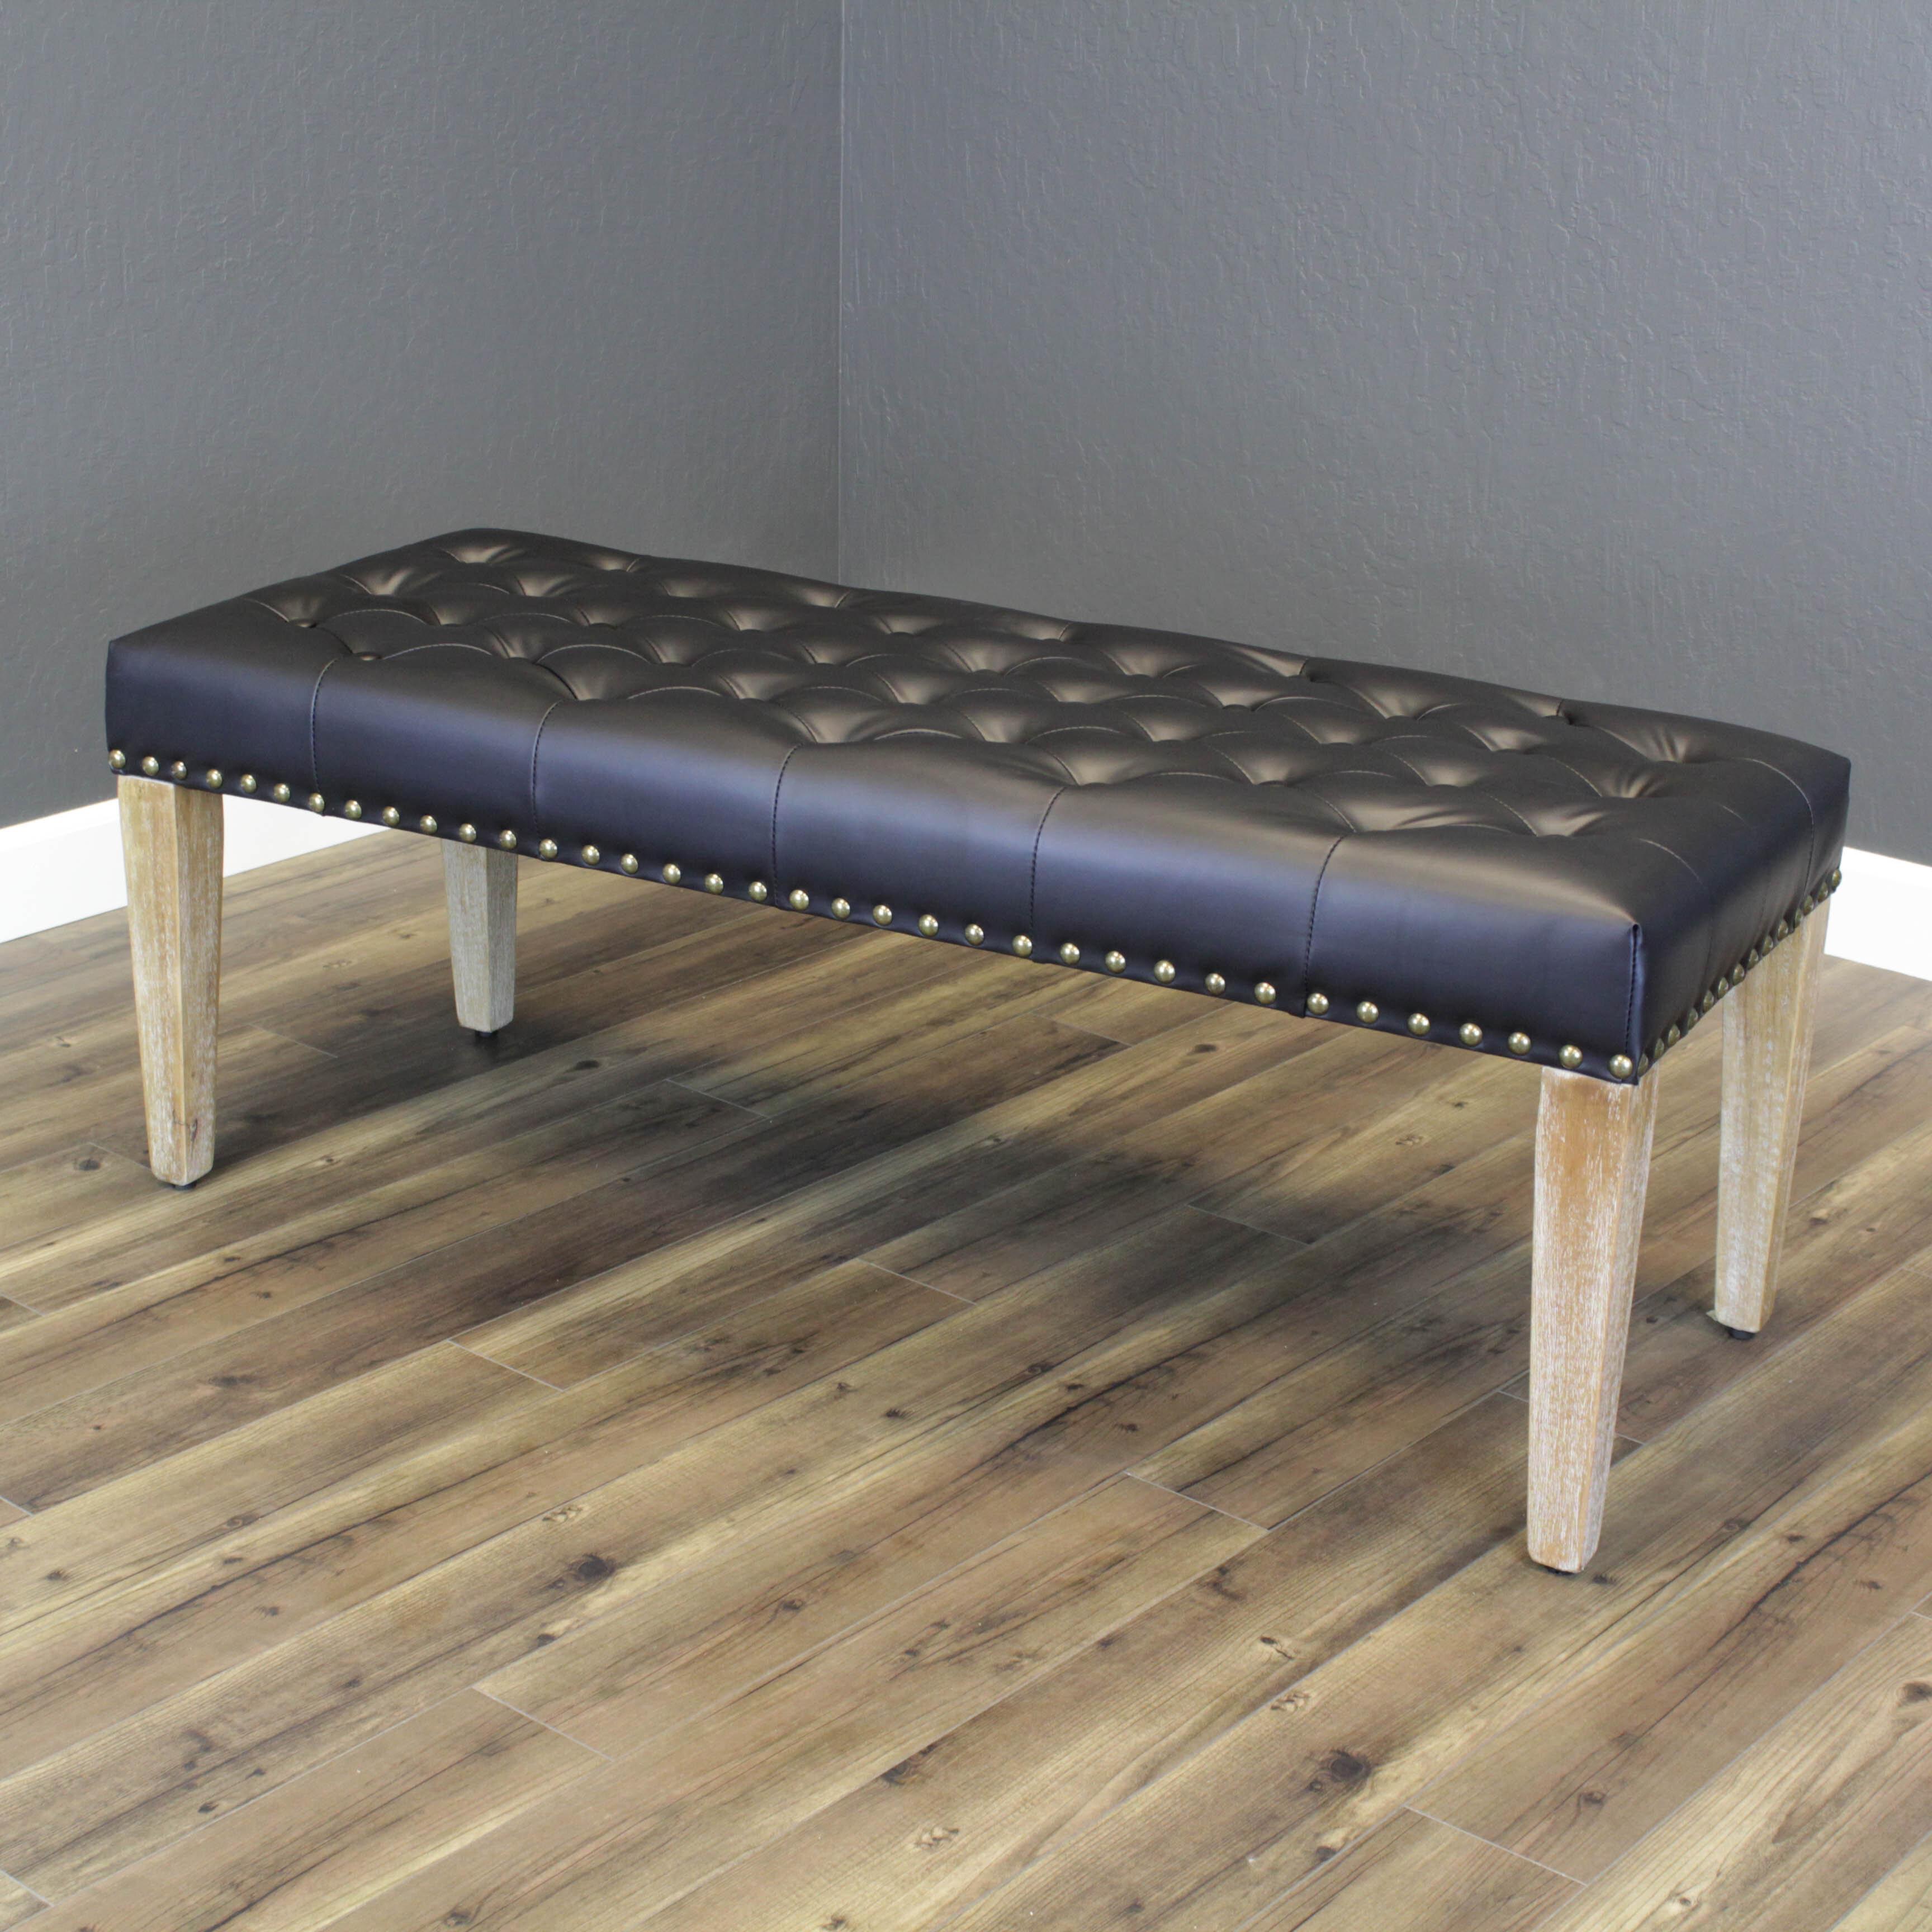 Gracie Oaks Whipton Faux Leather Bench Reviews Wayfair